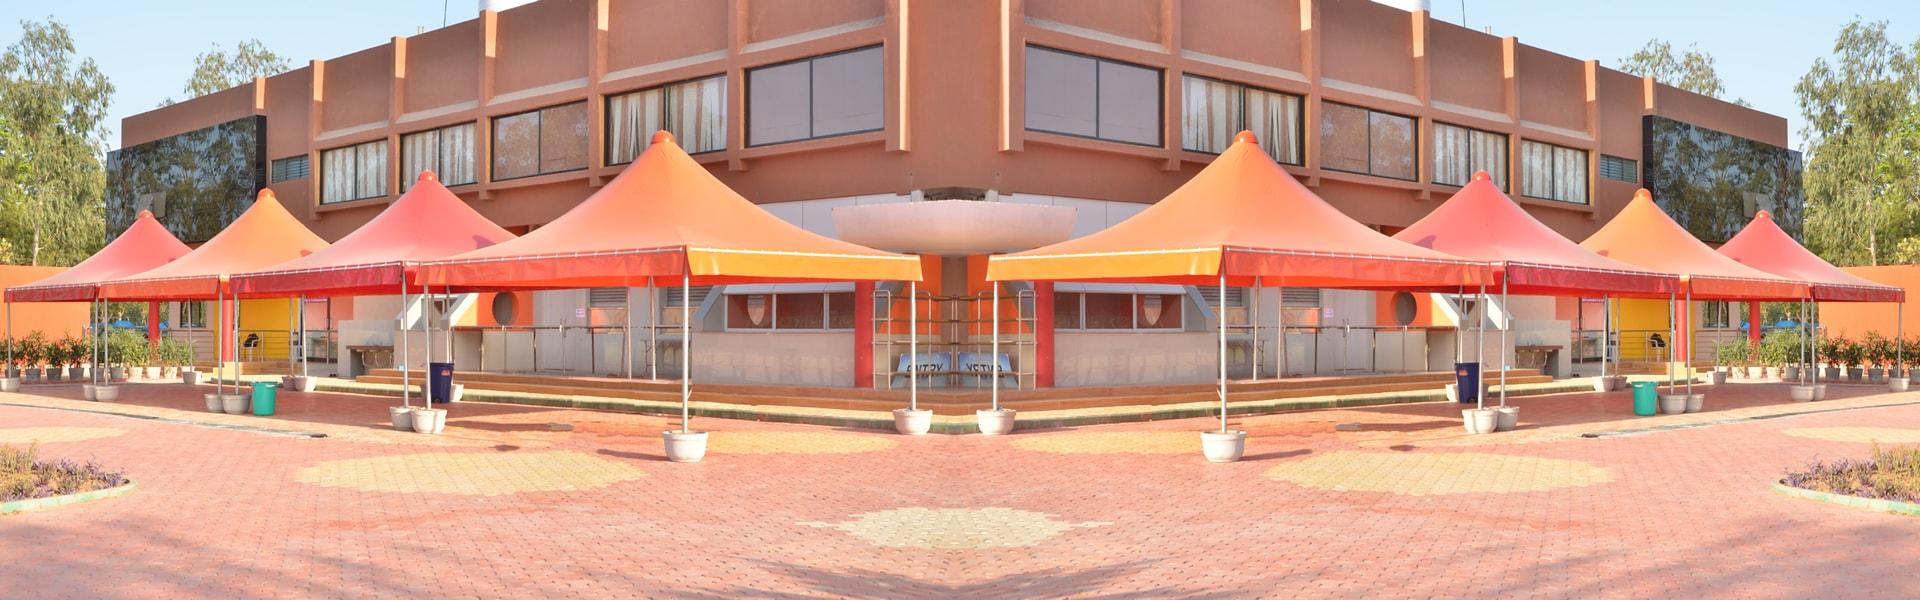 tensile structuremanufacturer in india